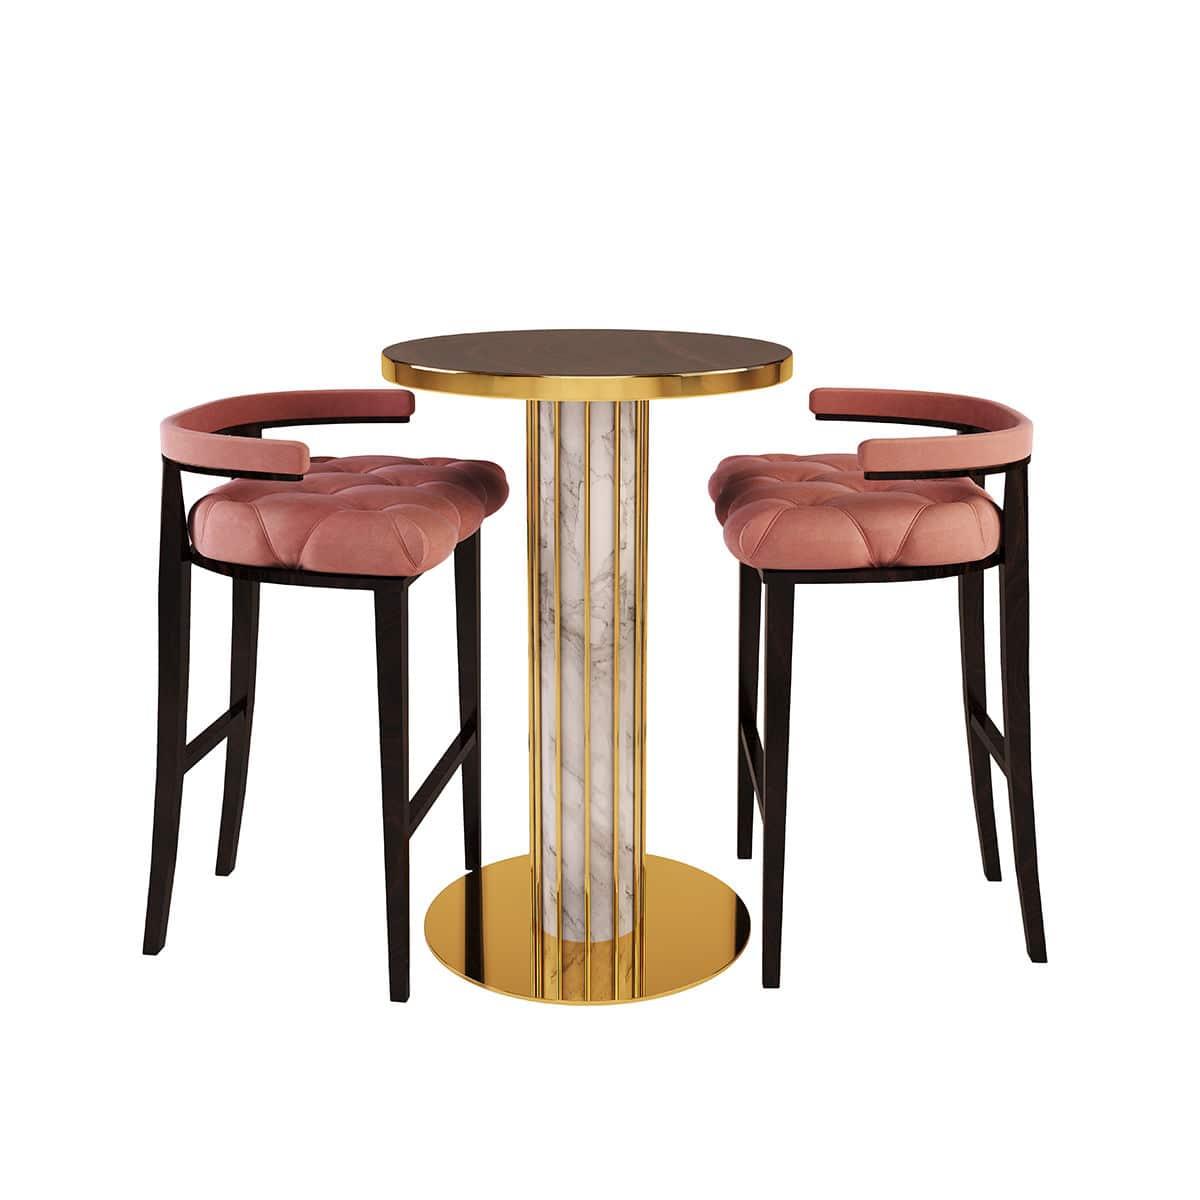 Contemporary high bar table - DANDELION - By Swans - wood veneer